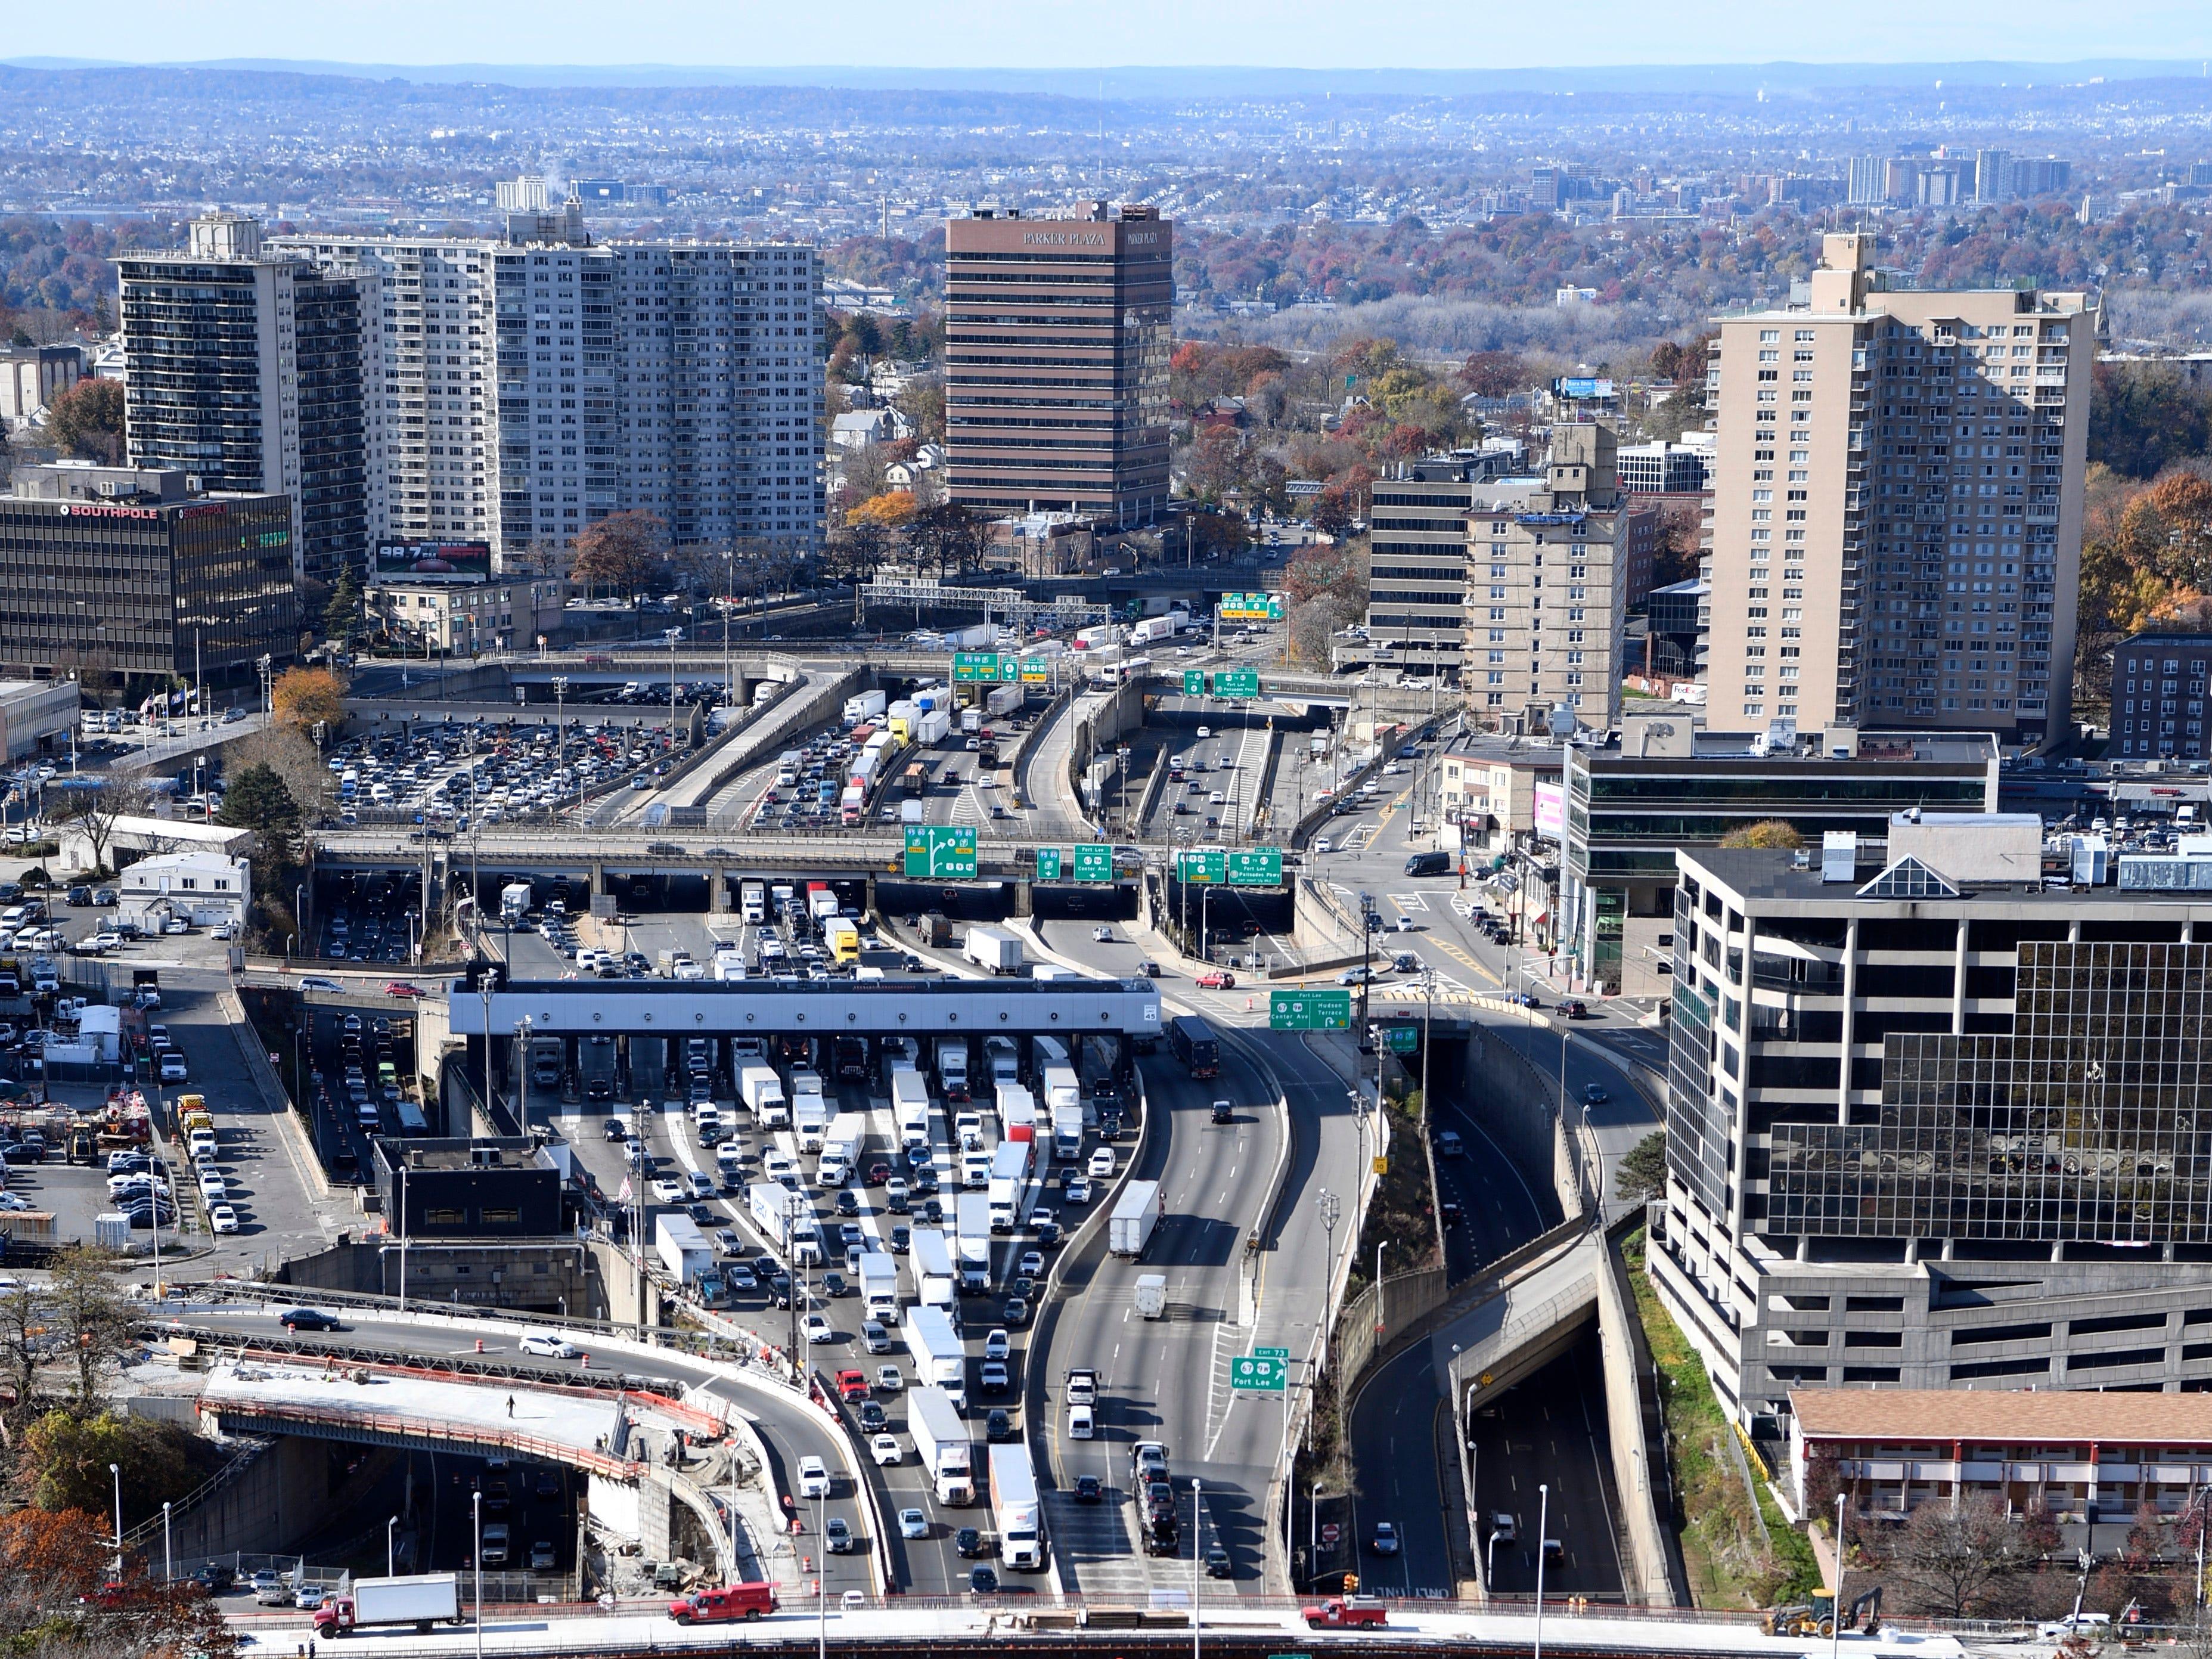 Interstate 95 seen from the George Washington Bridge, looking west toward Fort Lee, NJ, on Wednesday, Nov. 14, 2018.